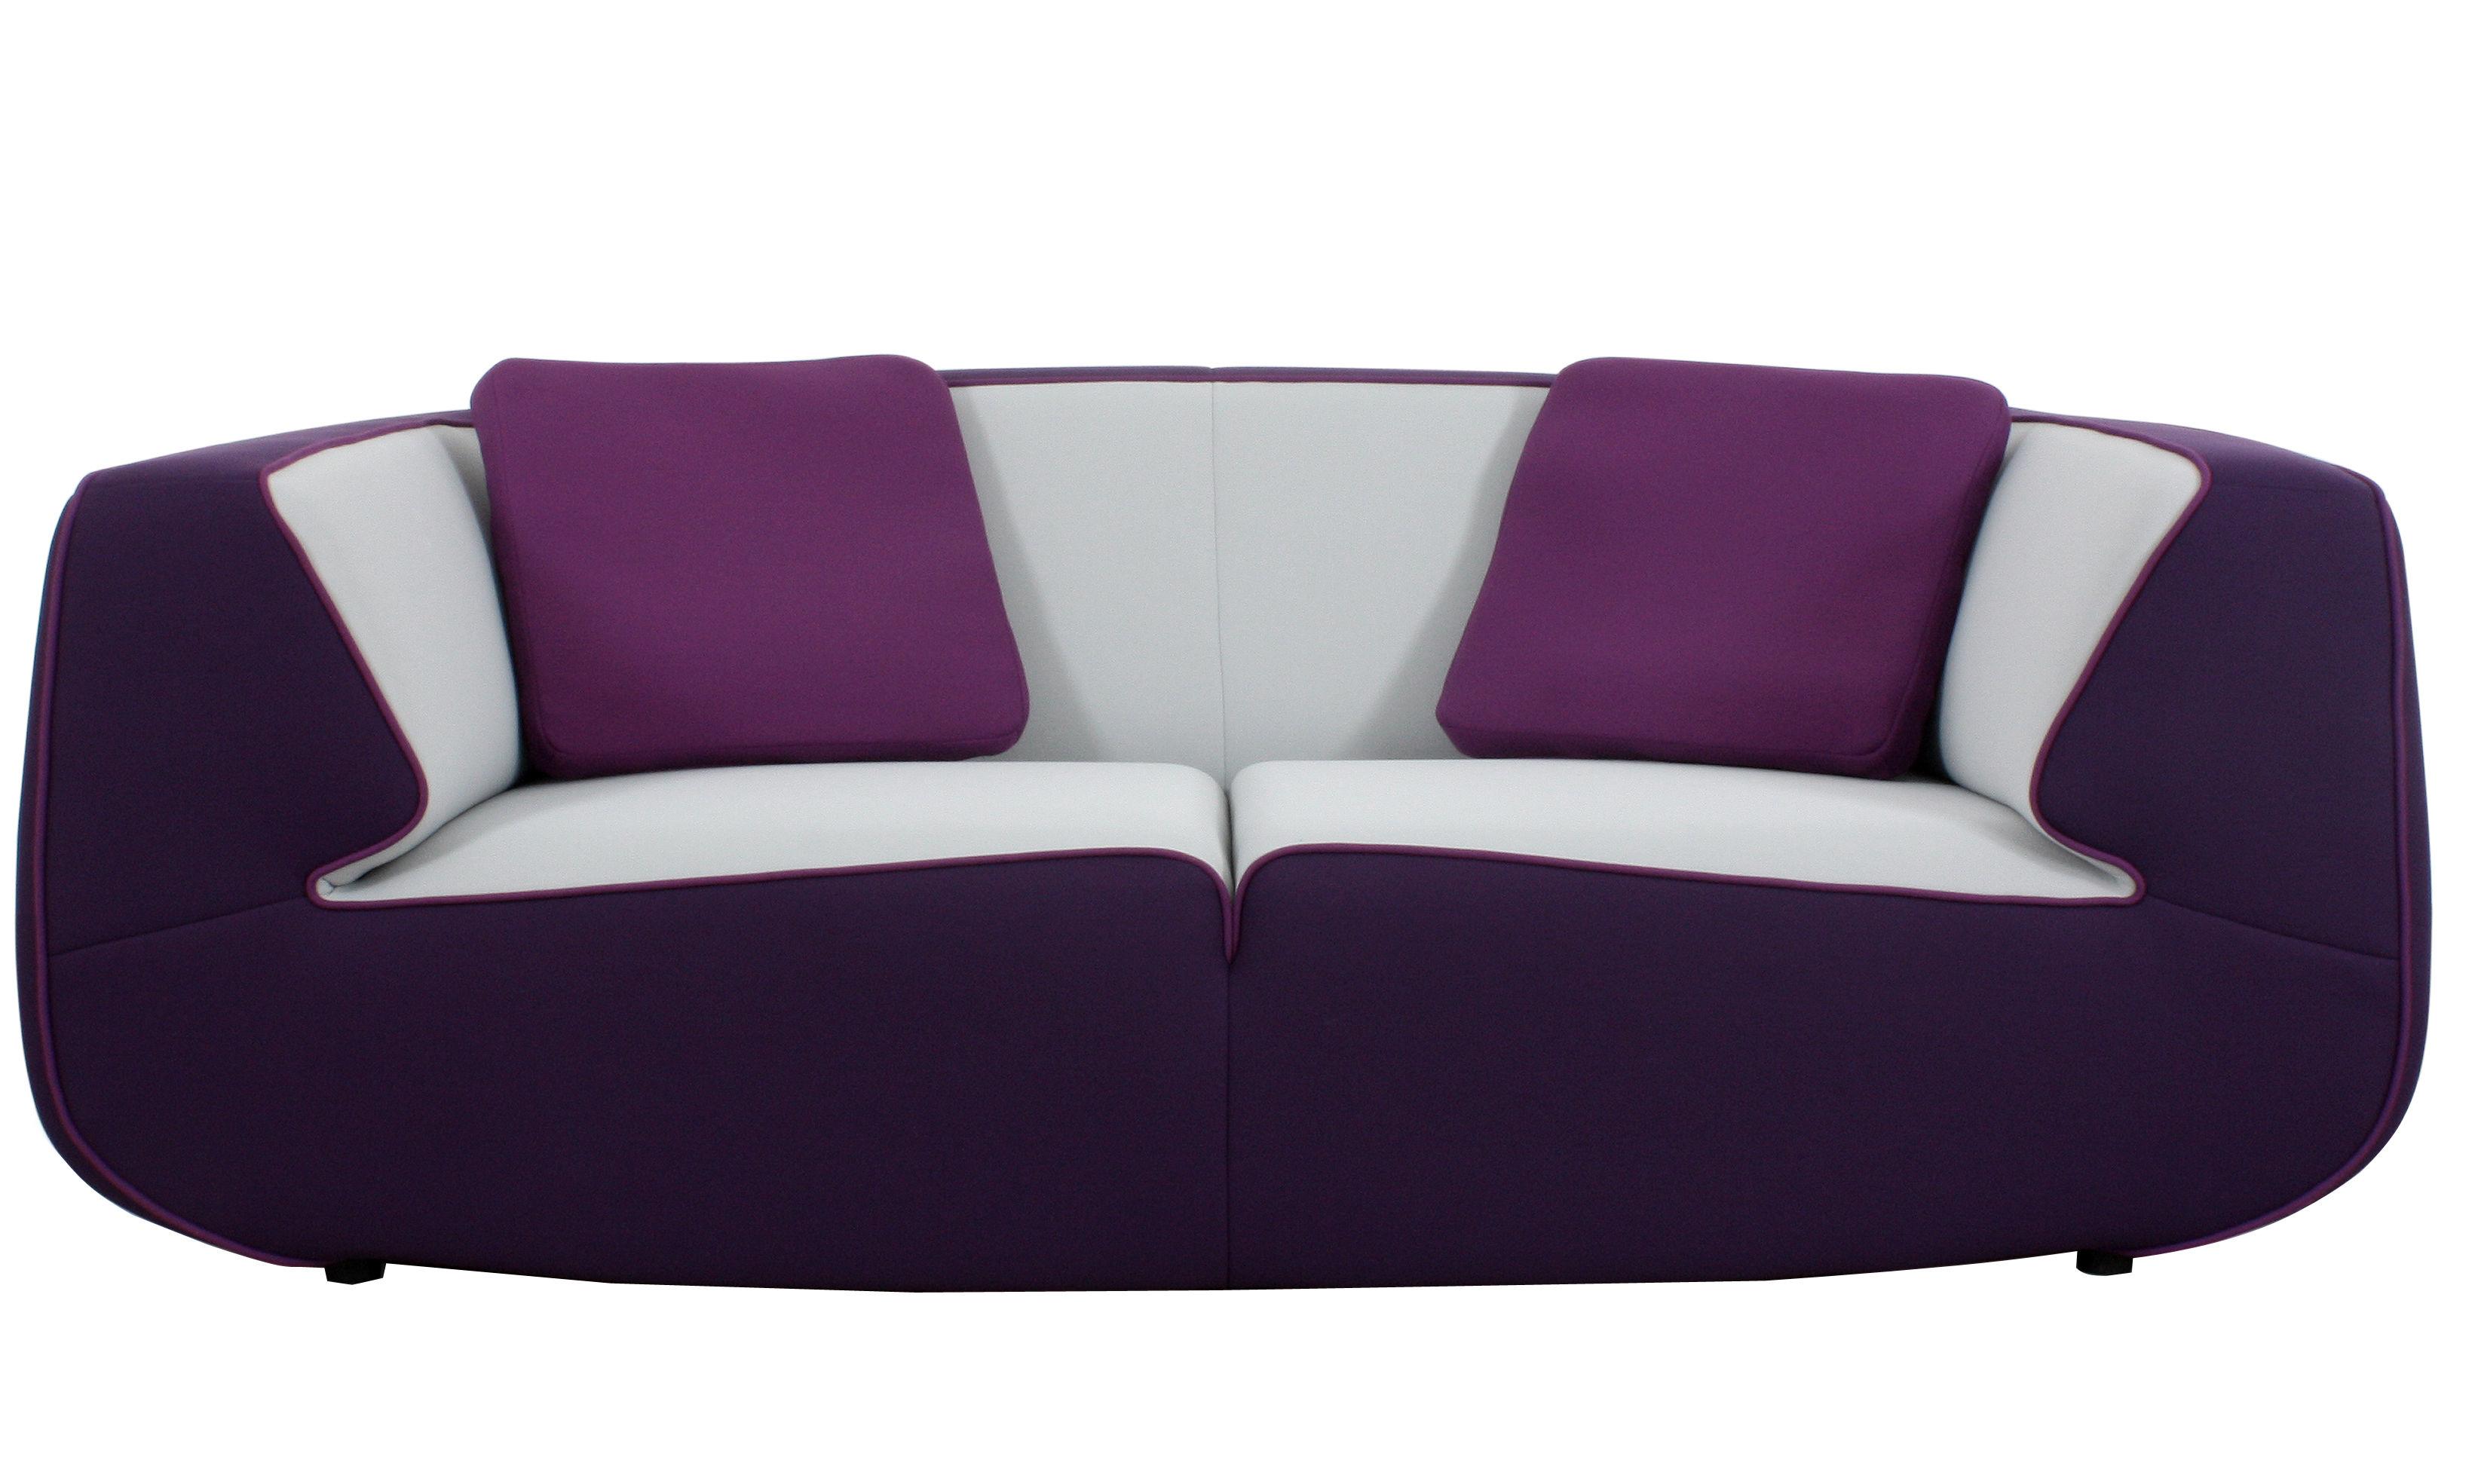 Canap droit bump by ora ito 2 3 places l 198 cm violet gris perle - Canape dunlopillo ora ito ...